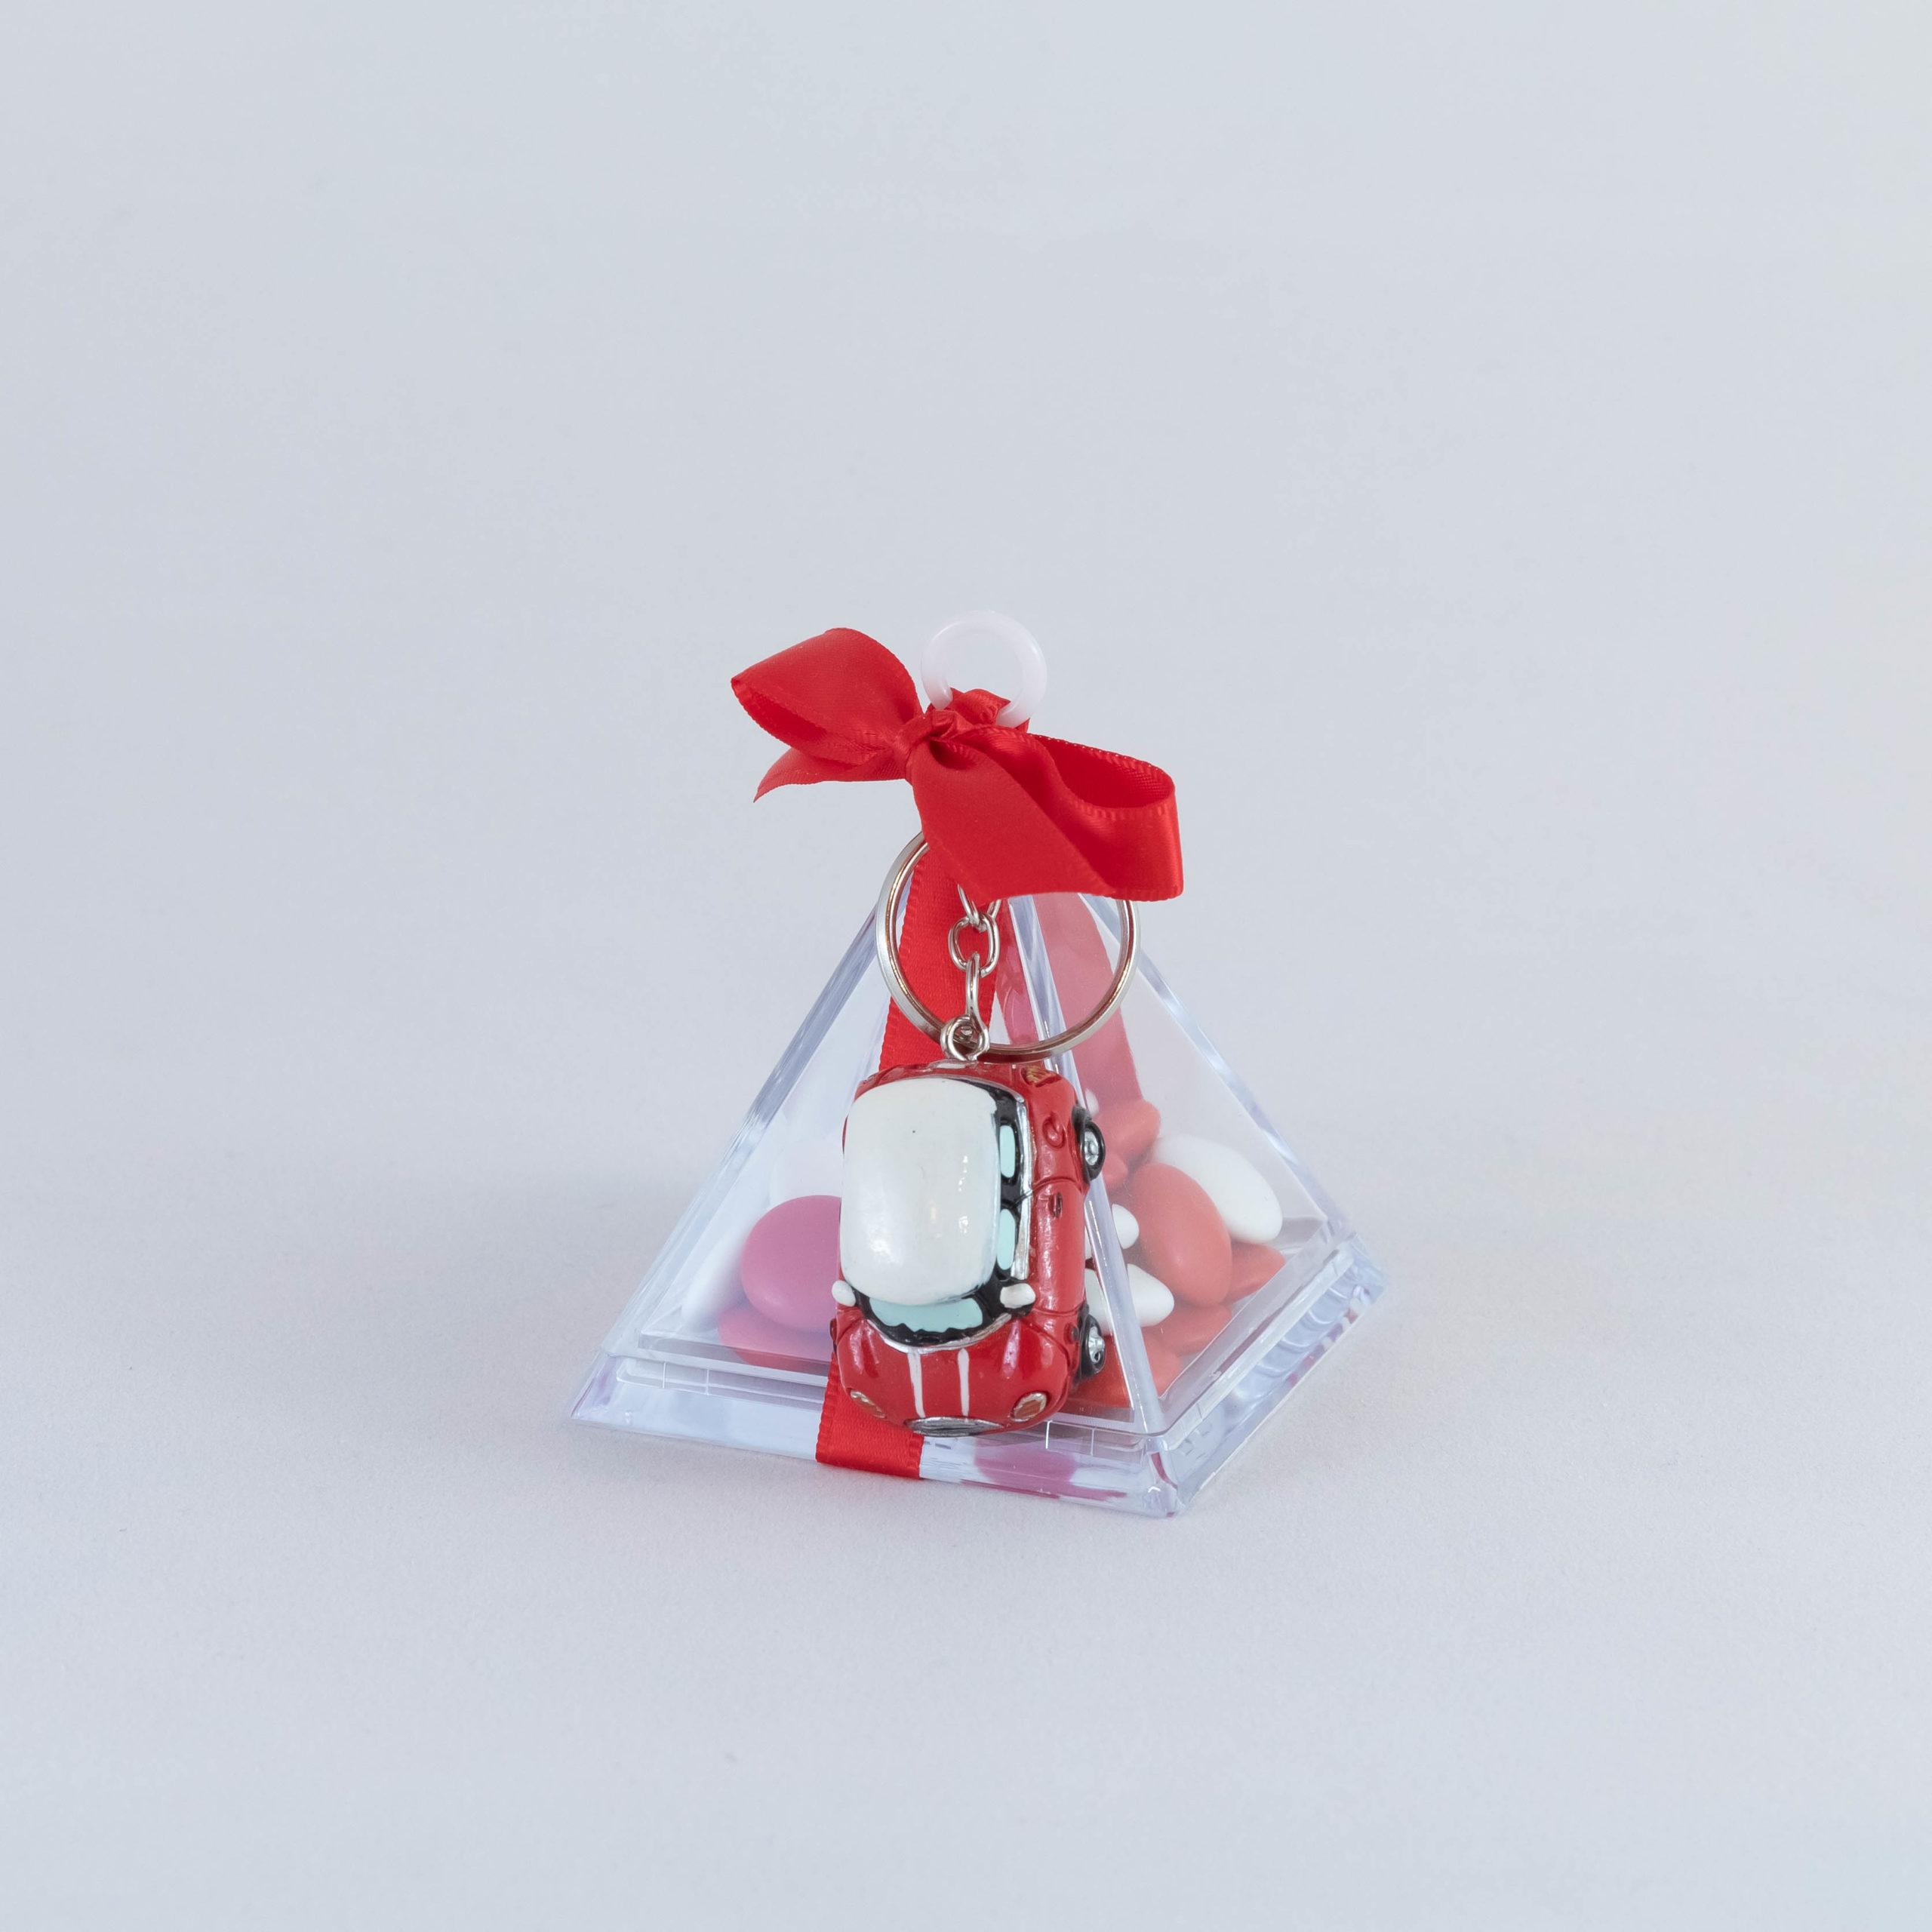 Mini Cooper rouge pyramide - Véhicule Image